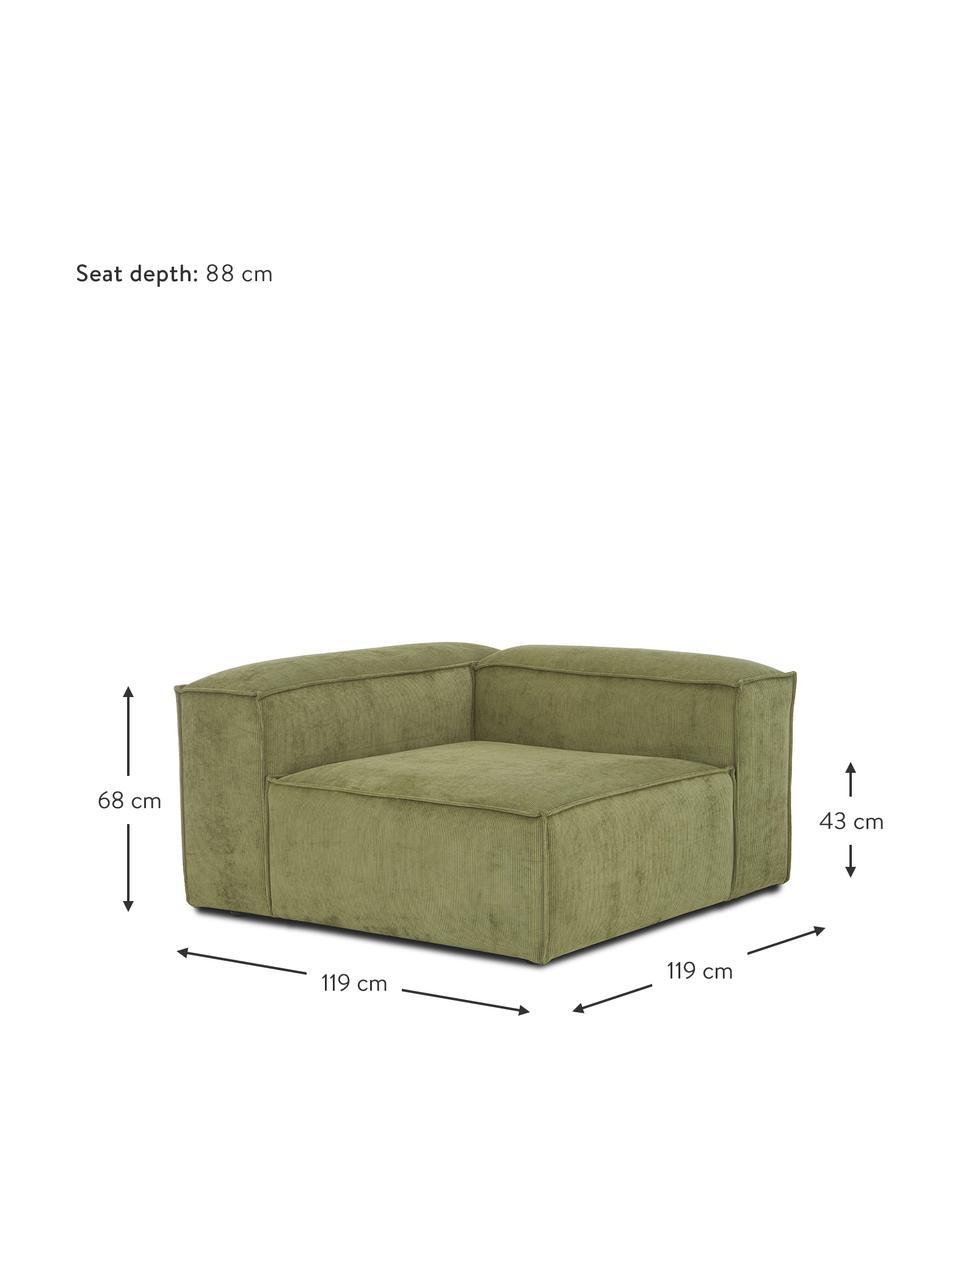 Hoekmodule Lennon in groen van corduroy, Bekleding: corduroy (92% polyester, , Frame: massief grenenhout, multi, Poten: kunststof De poten bevind, Corduroy groen, B 119 x D 119 cm